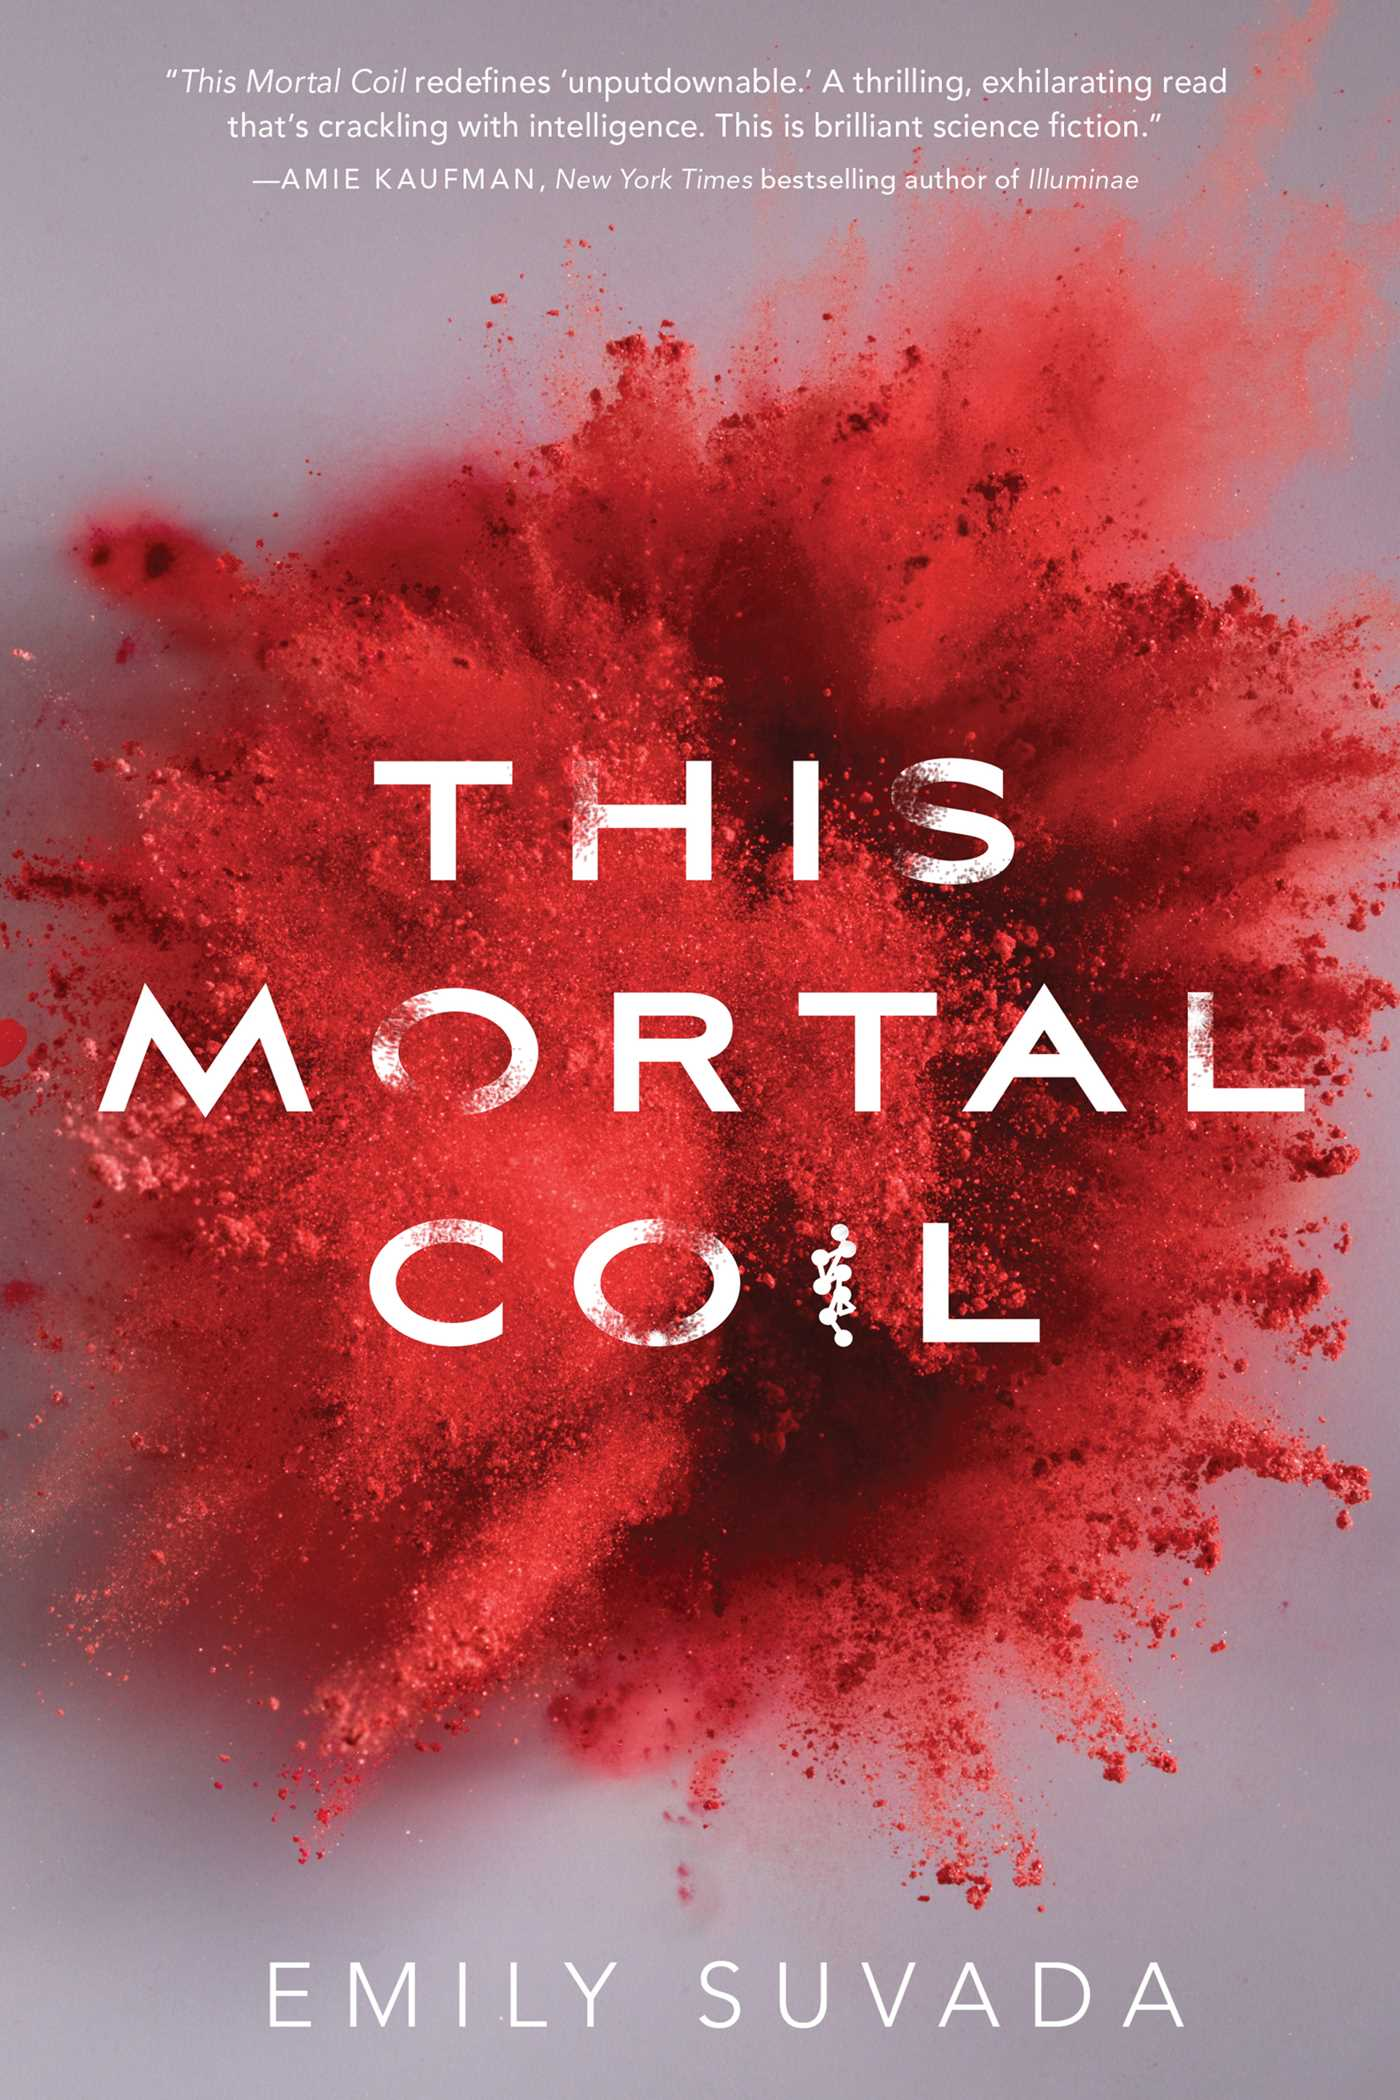 This mortal coil 9781481496346 hr